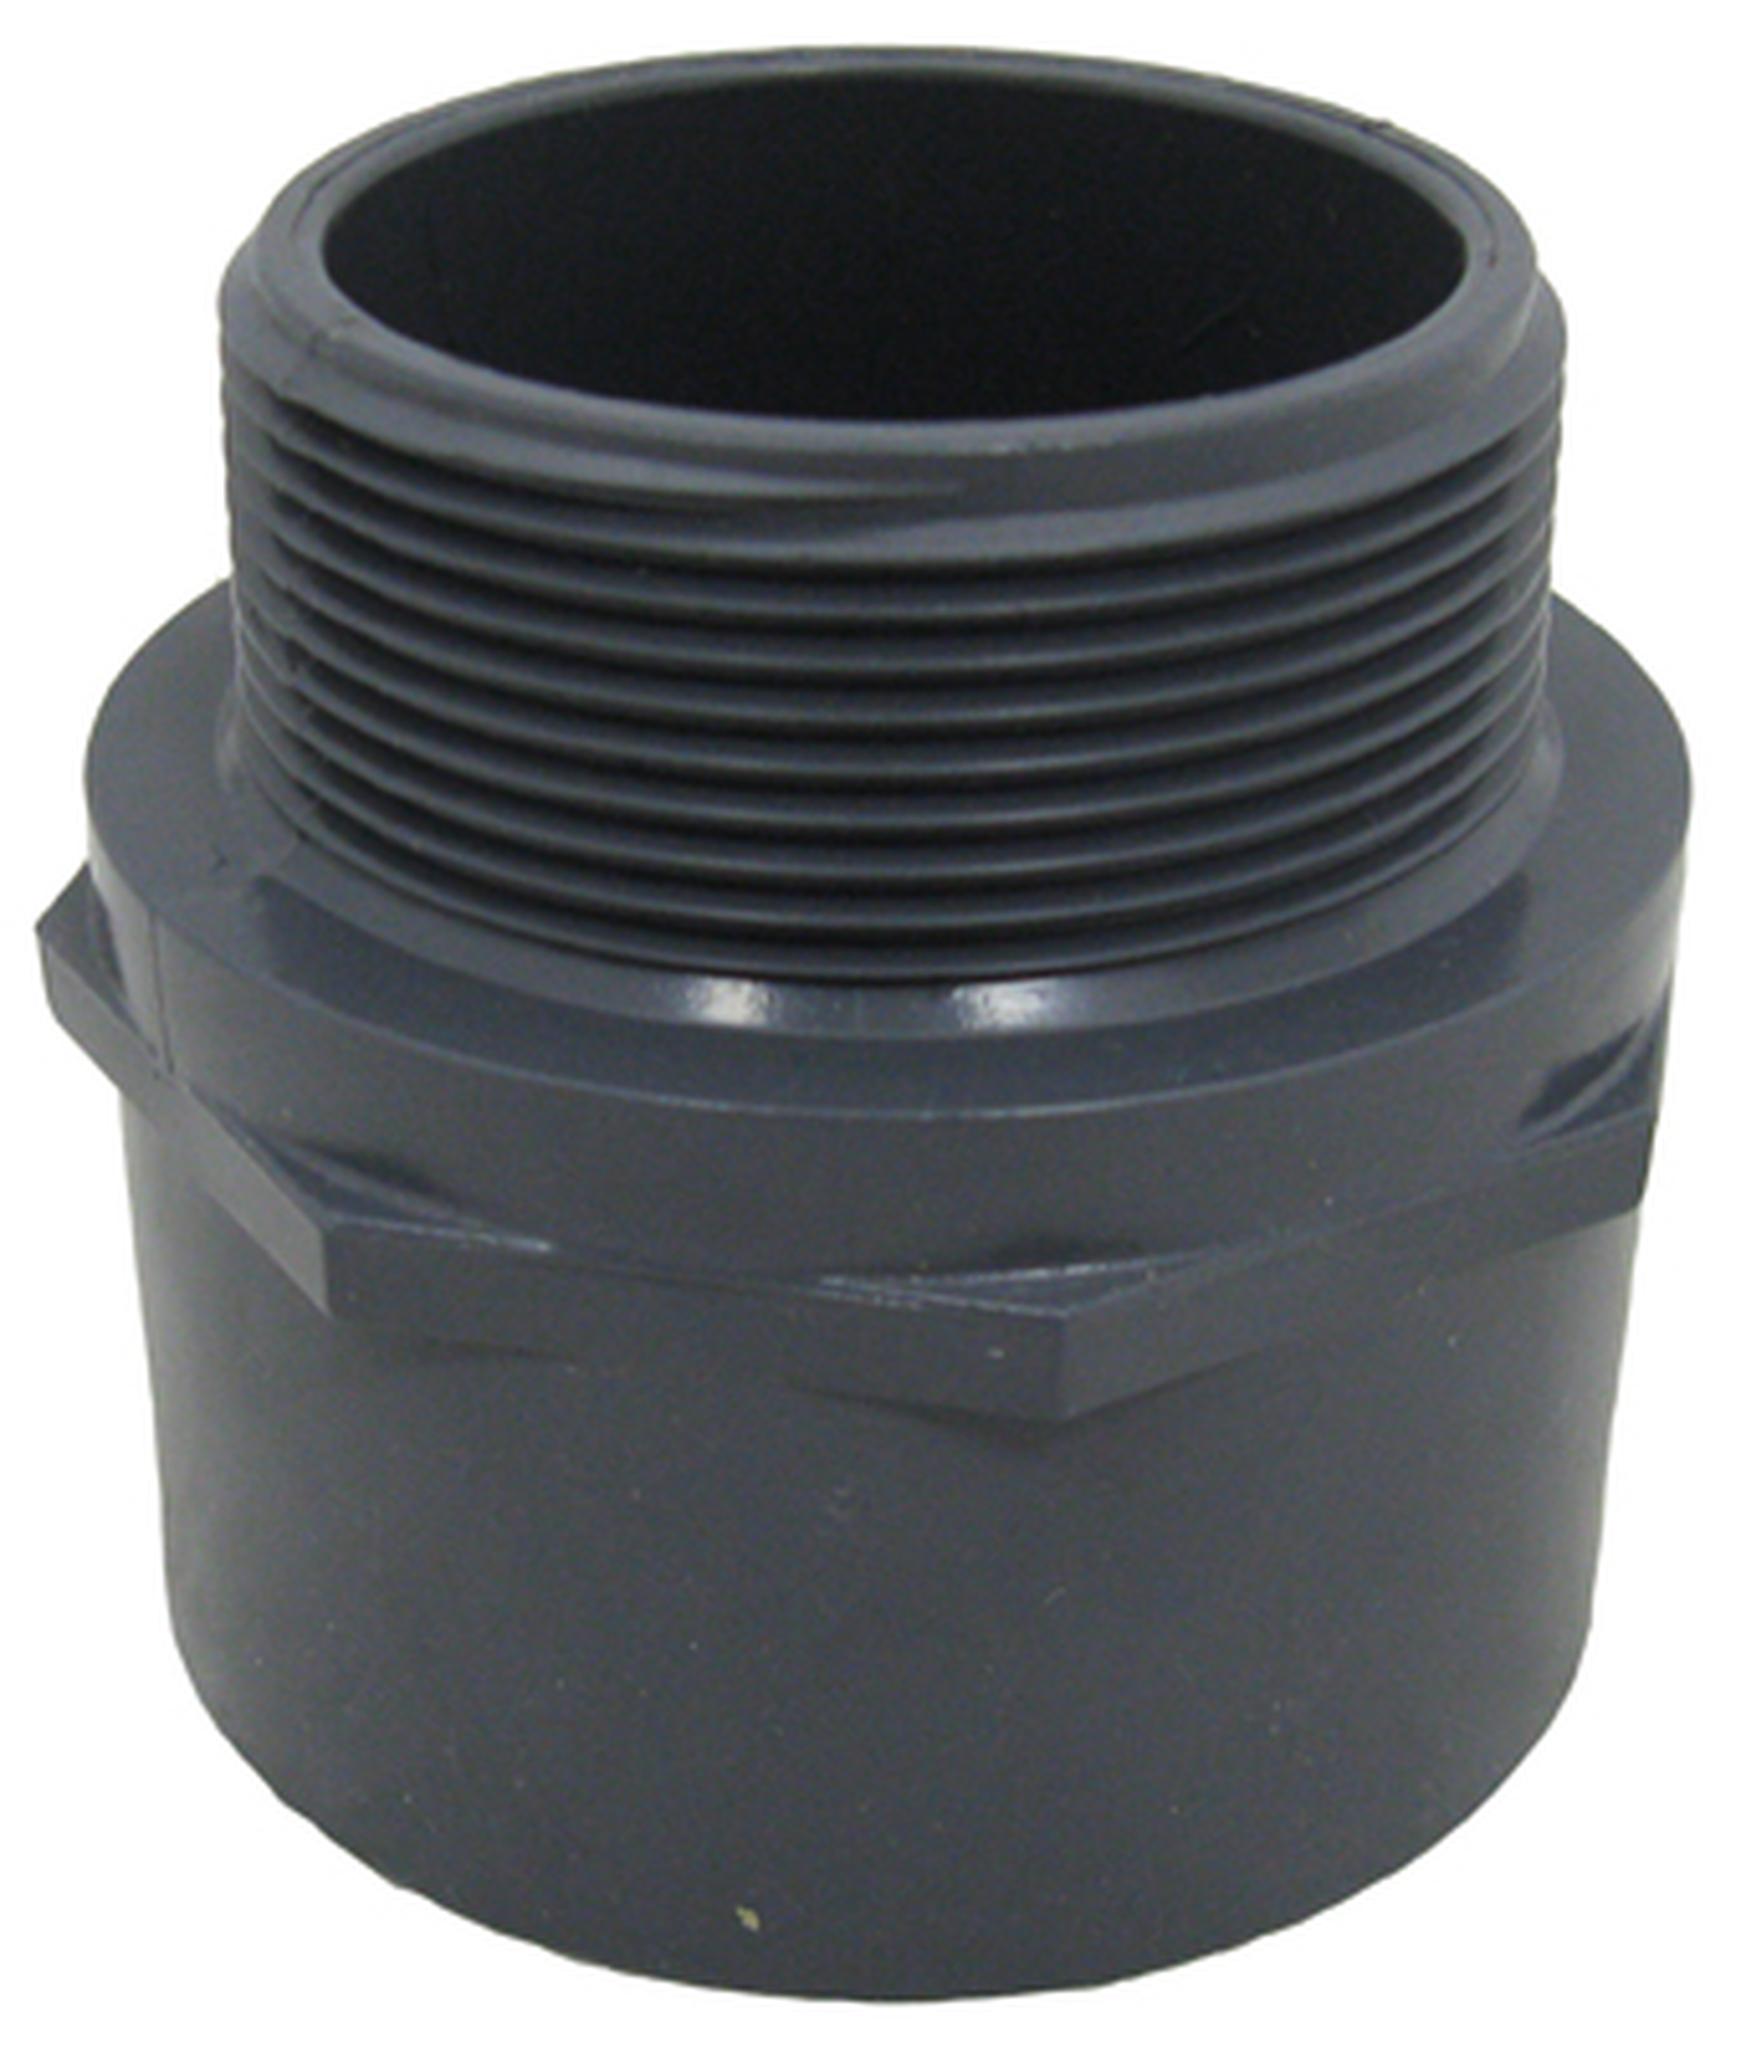 Hayward Pool Cartridge Filters & Parts